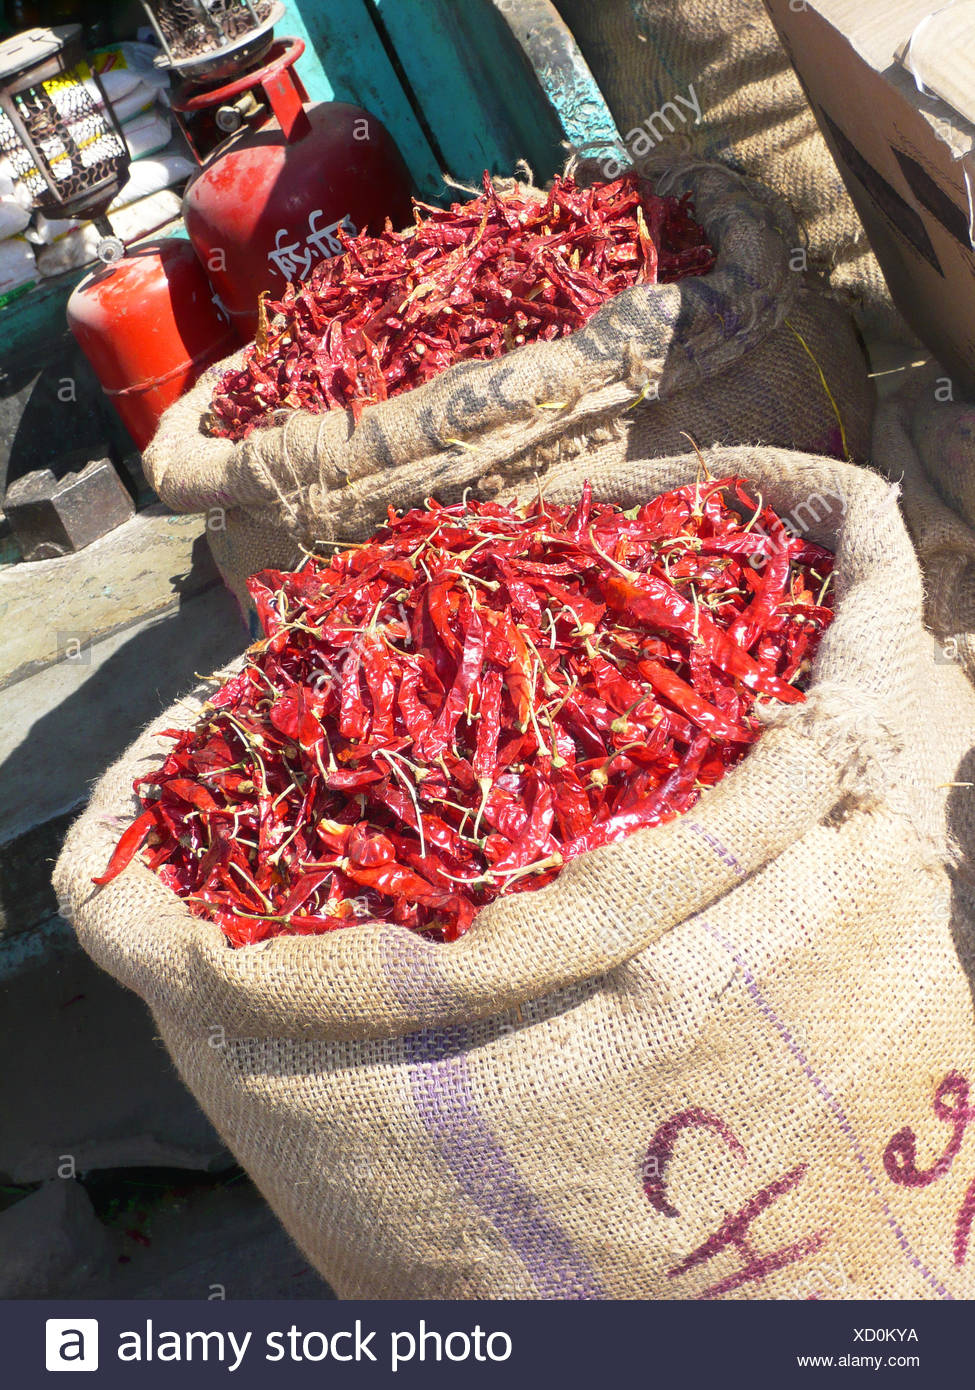 Sacks of red chilis, India - Stock Image